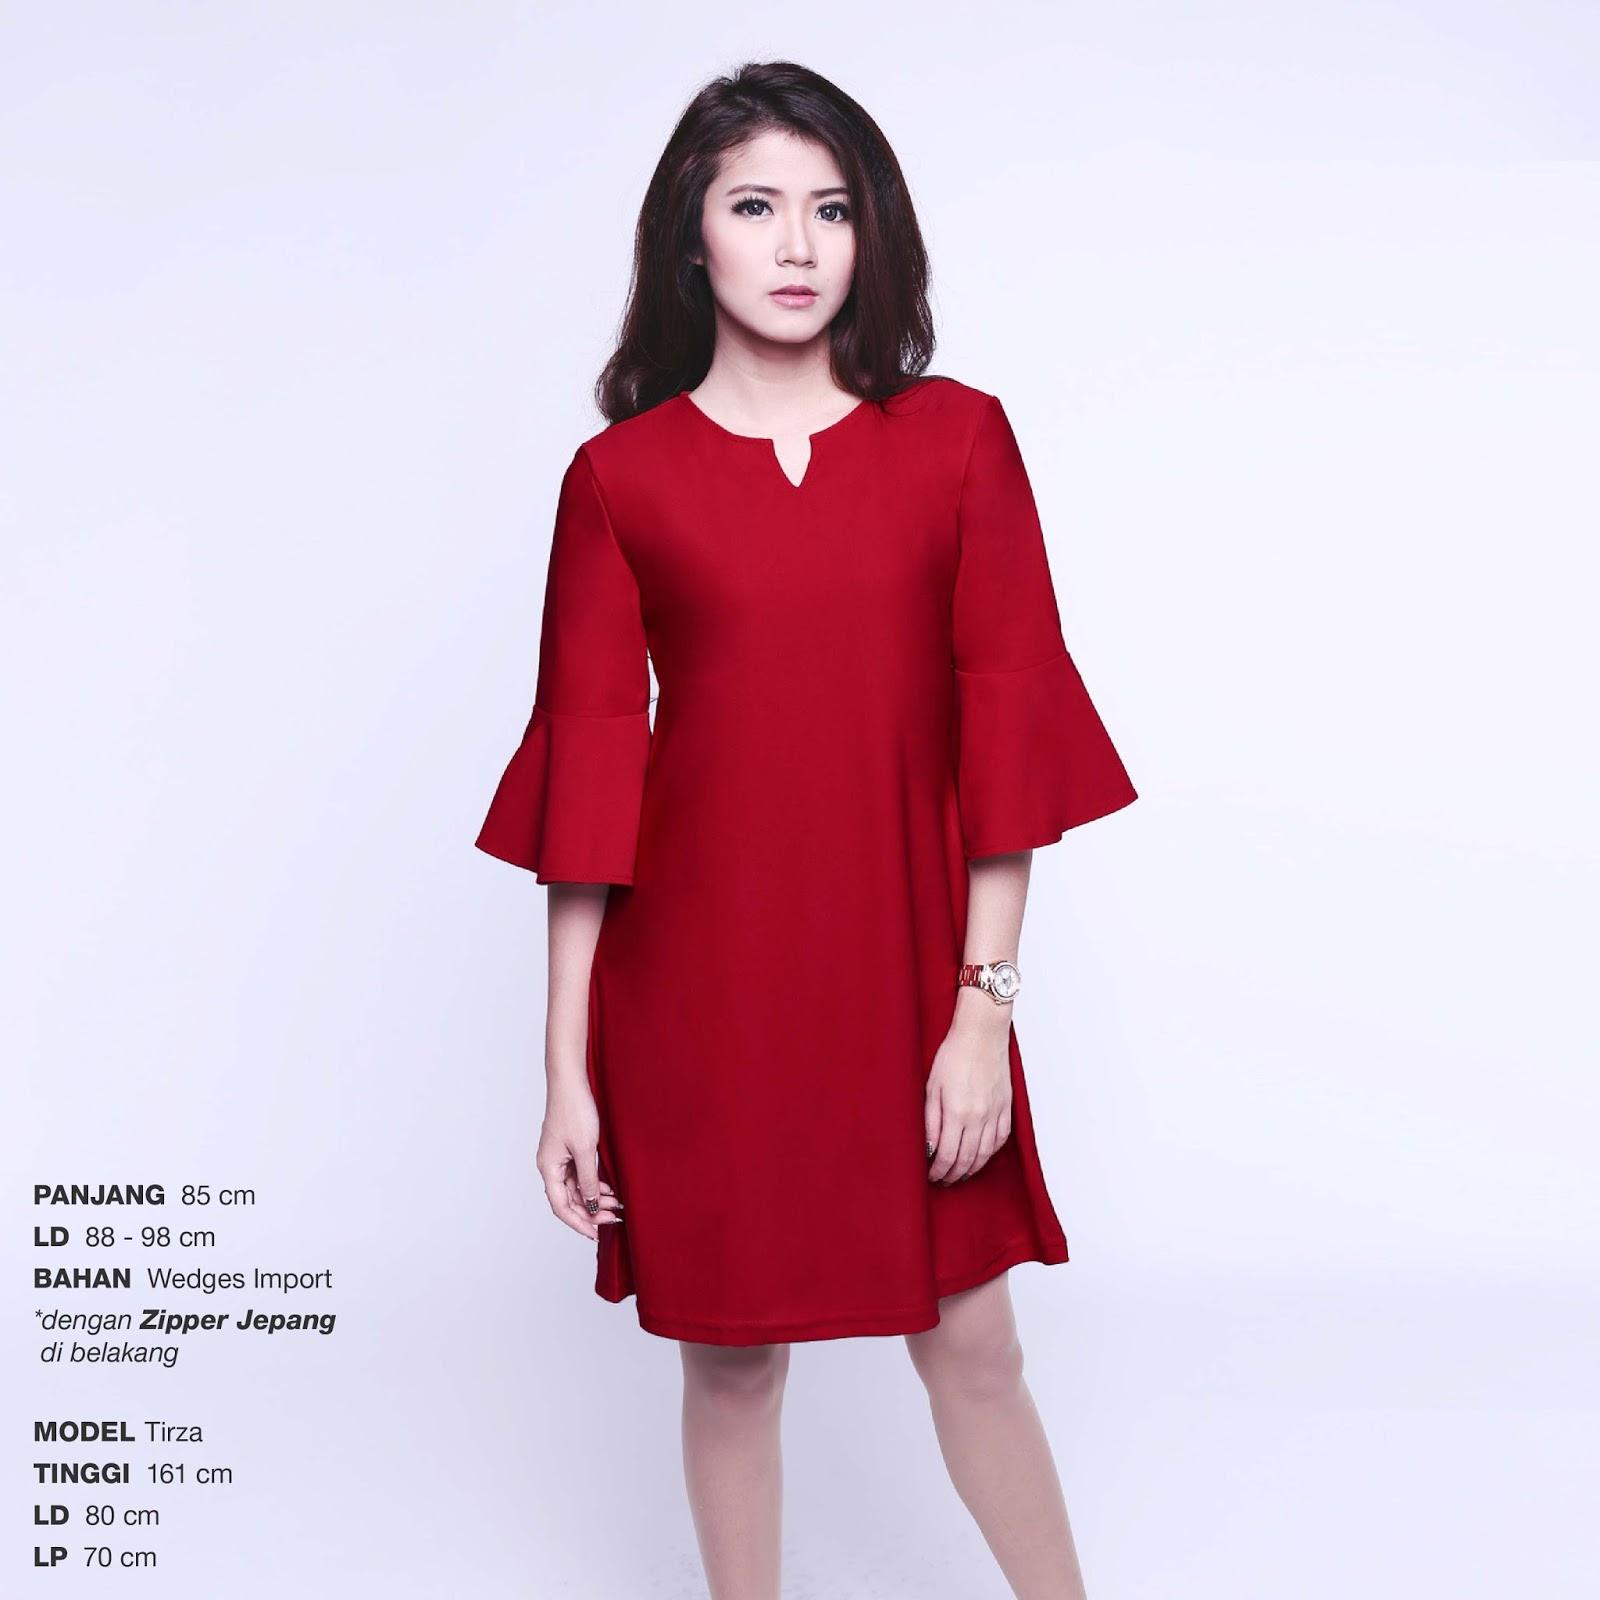 Wedges Import Tulip Key Tunic Dress Gaun Pakaian Wanita Ds854 Sabrina Tied Sleeve Blouse Atasan Bl885 Bahan